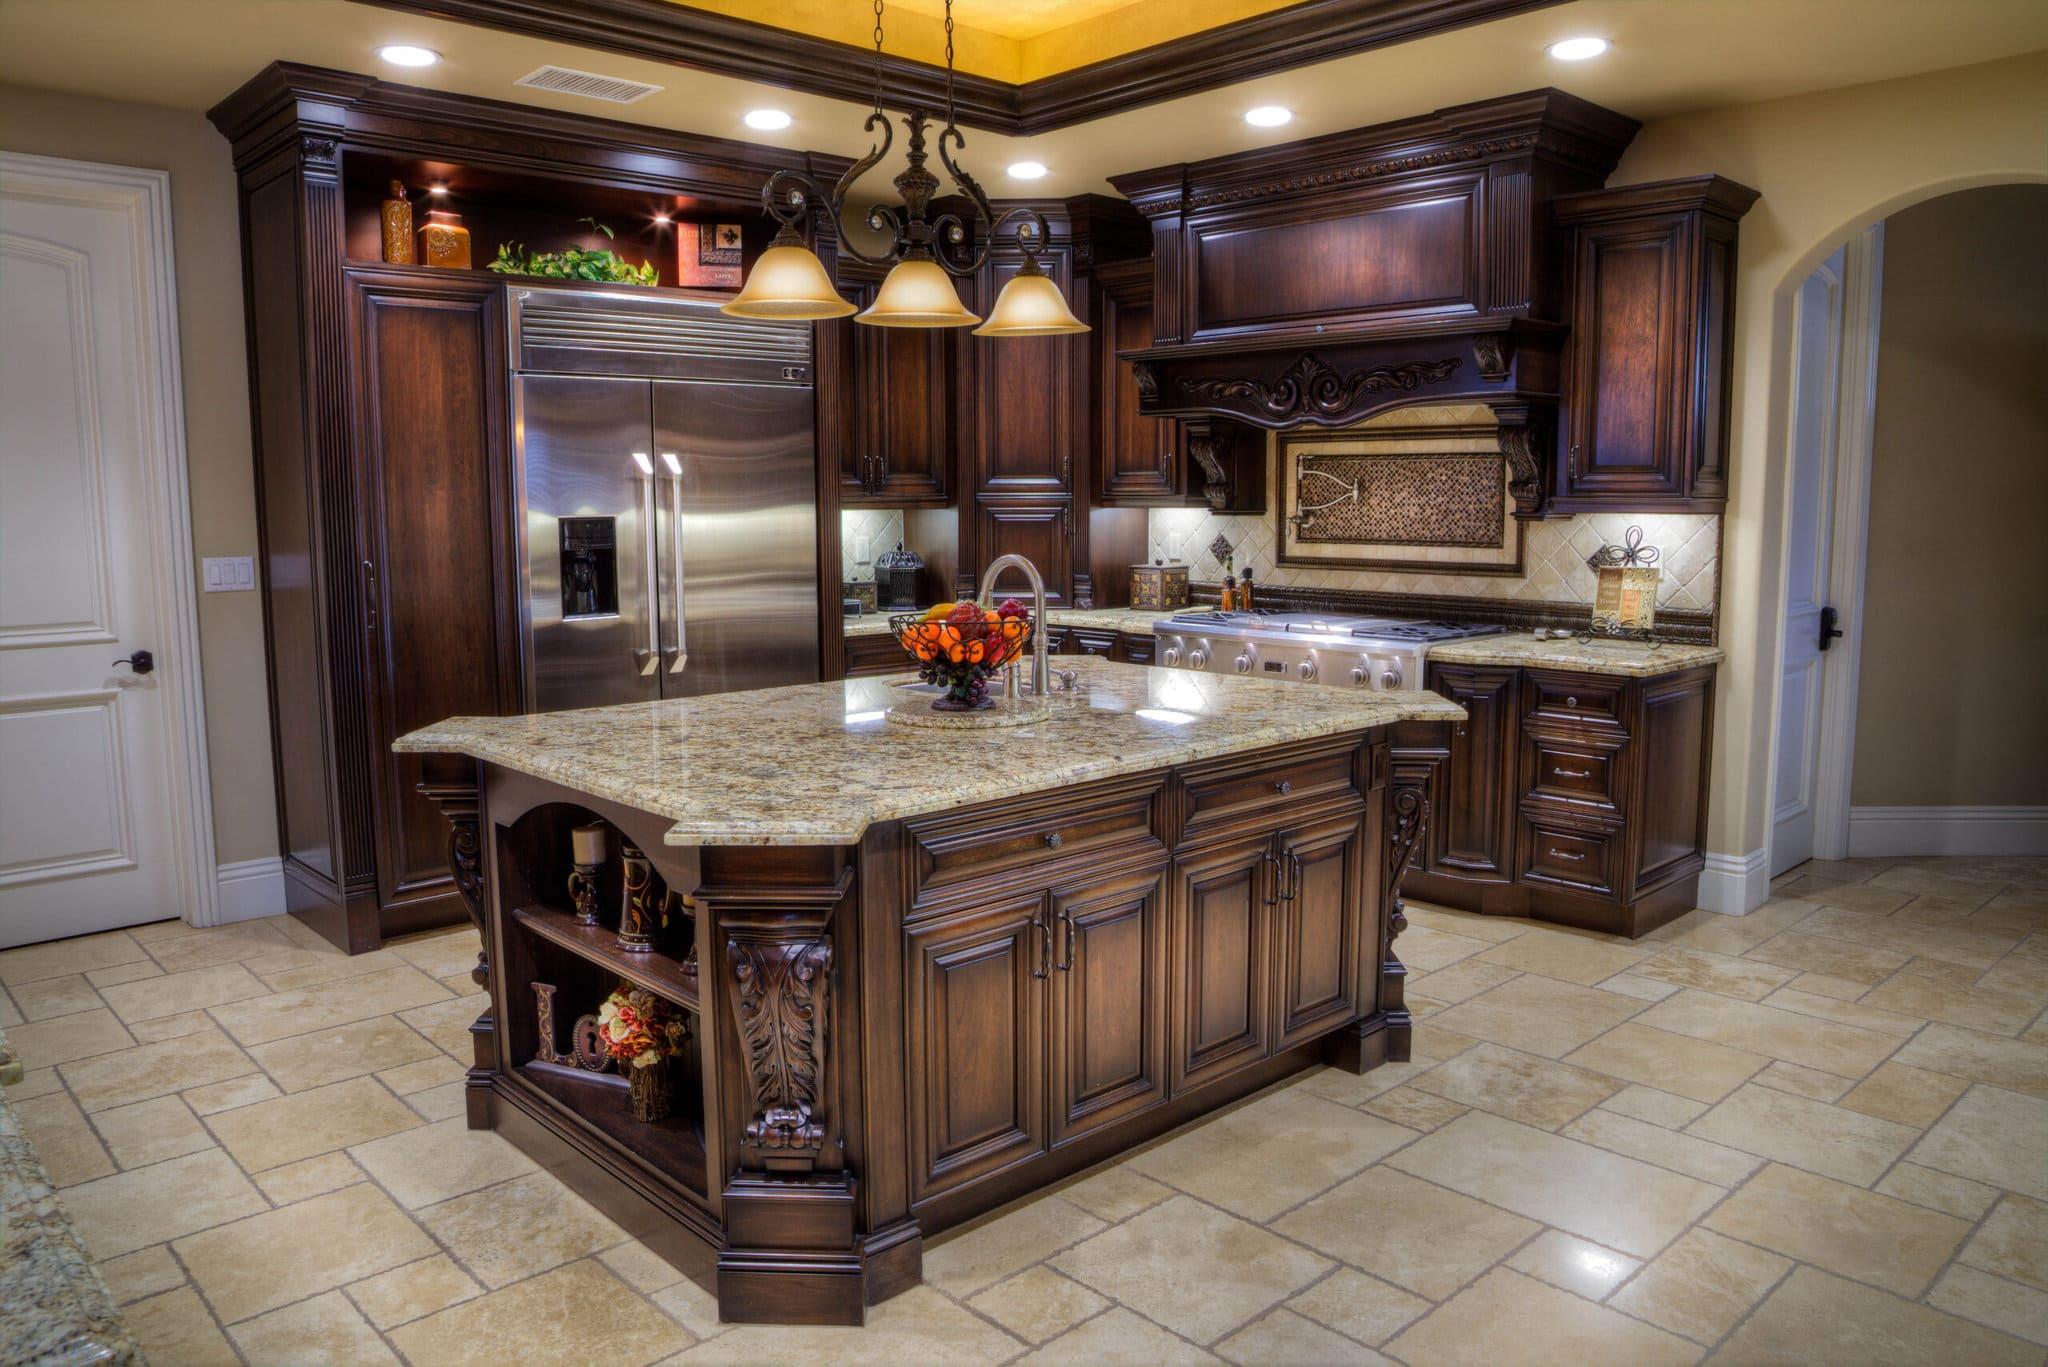 full-kitchen-1-2-compressed